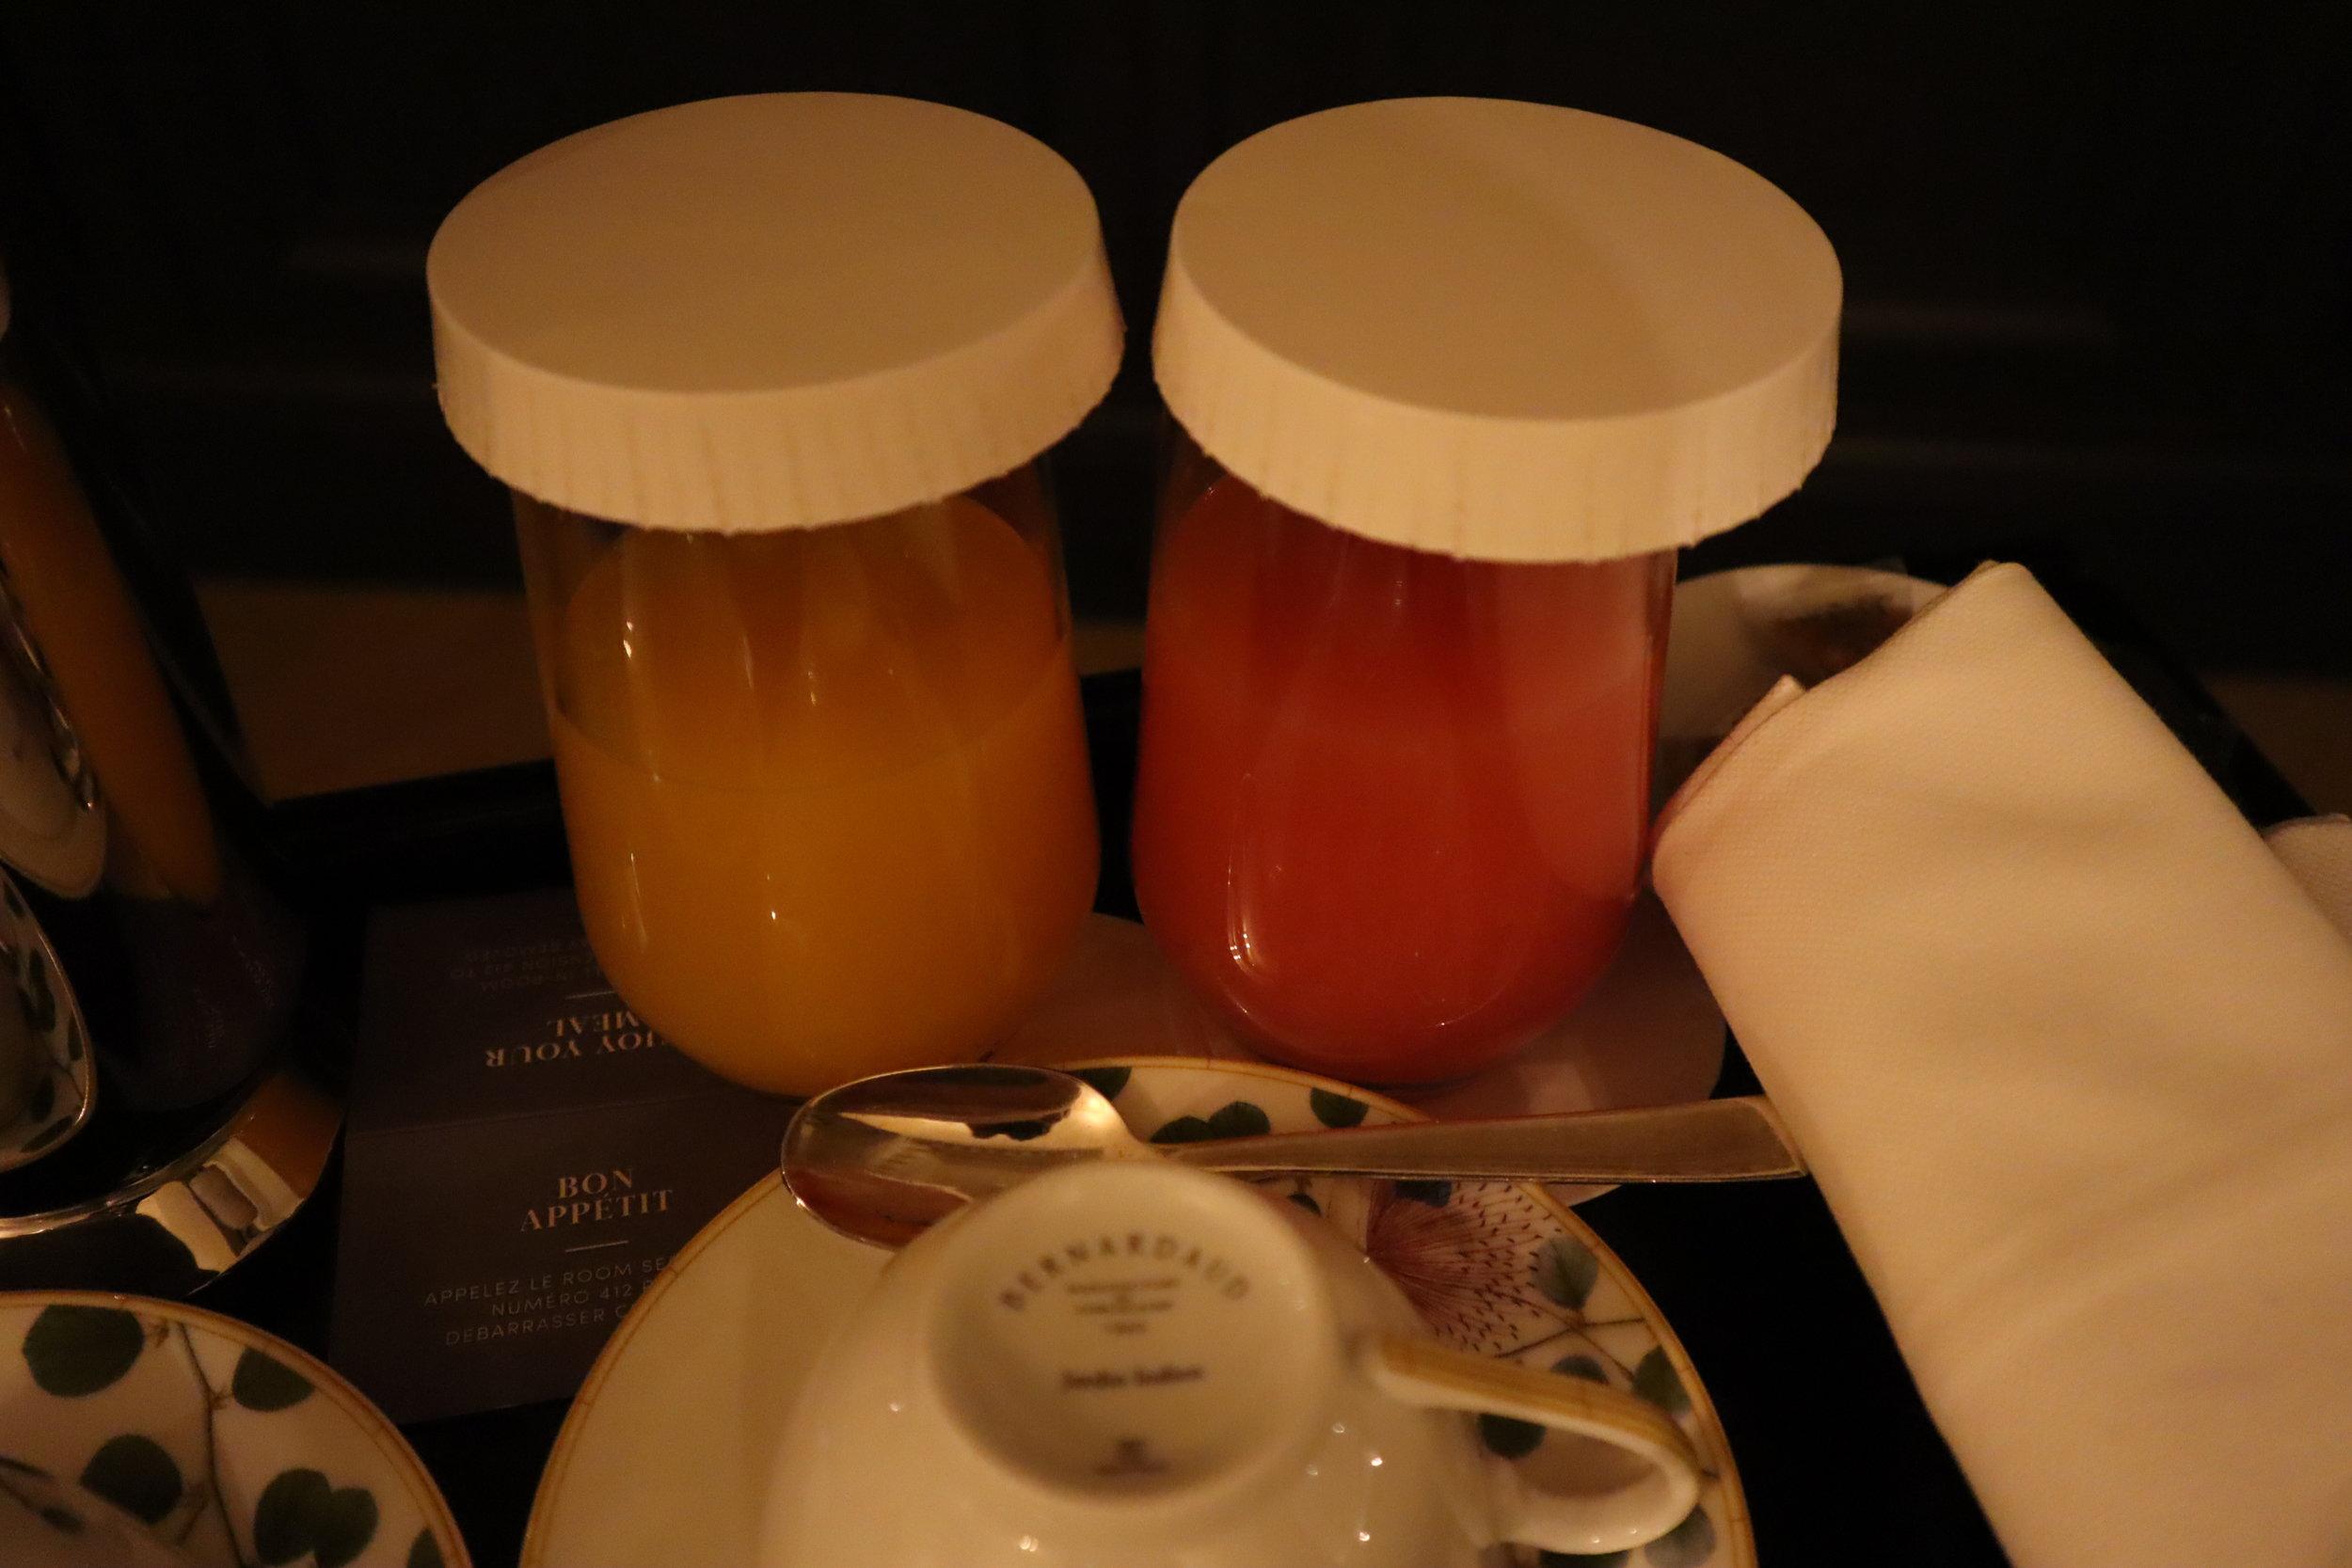 Hôtel de Berri Paris – American Breakfast juice